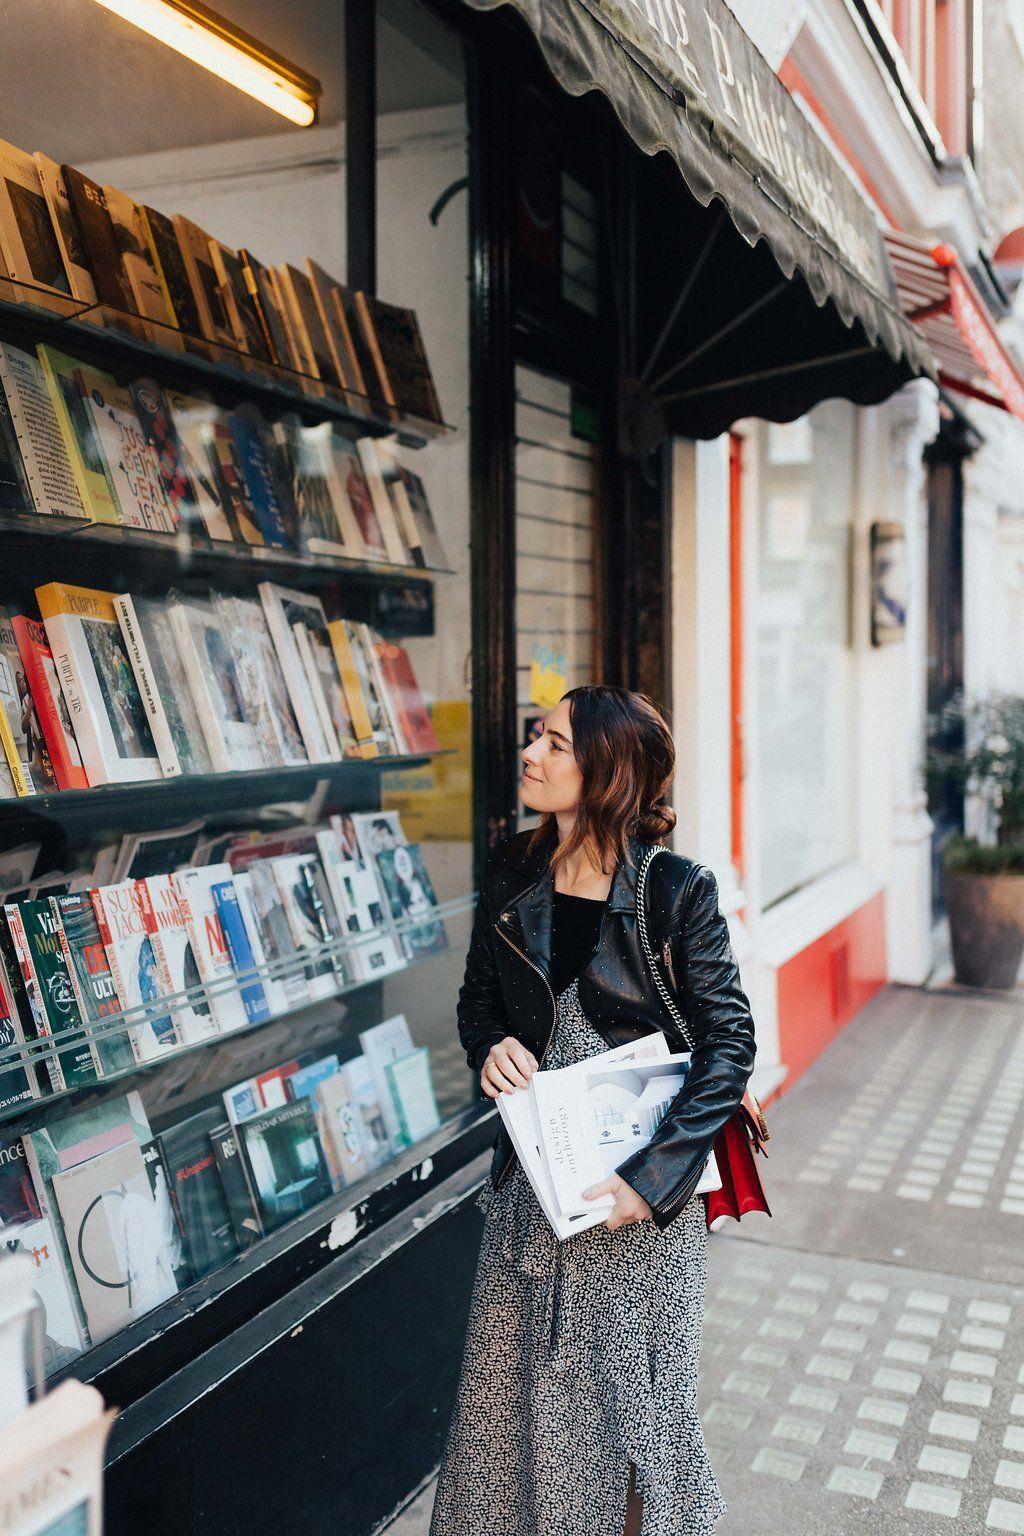 cheetah is the new black #fashion in #London #wanderlust #travel